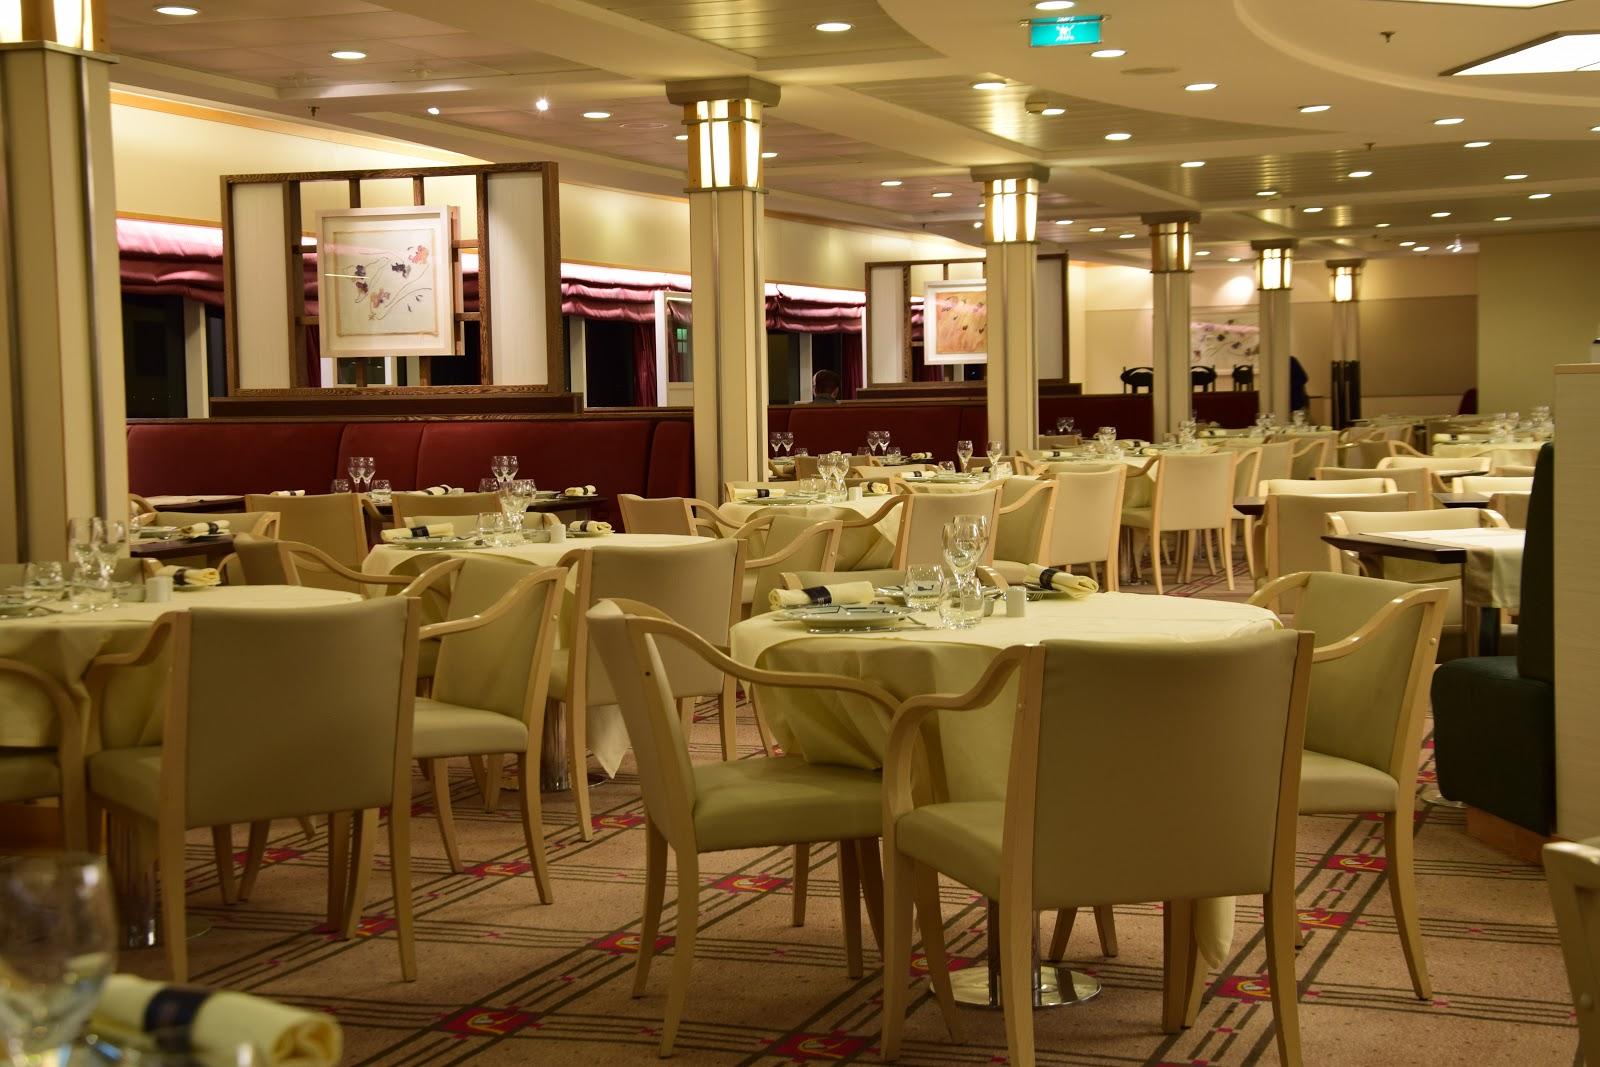 Vmf Alifesailingcruiseferries Blogspot Co Uk Elegant Dining